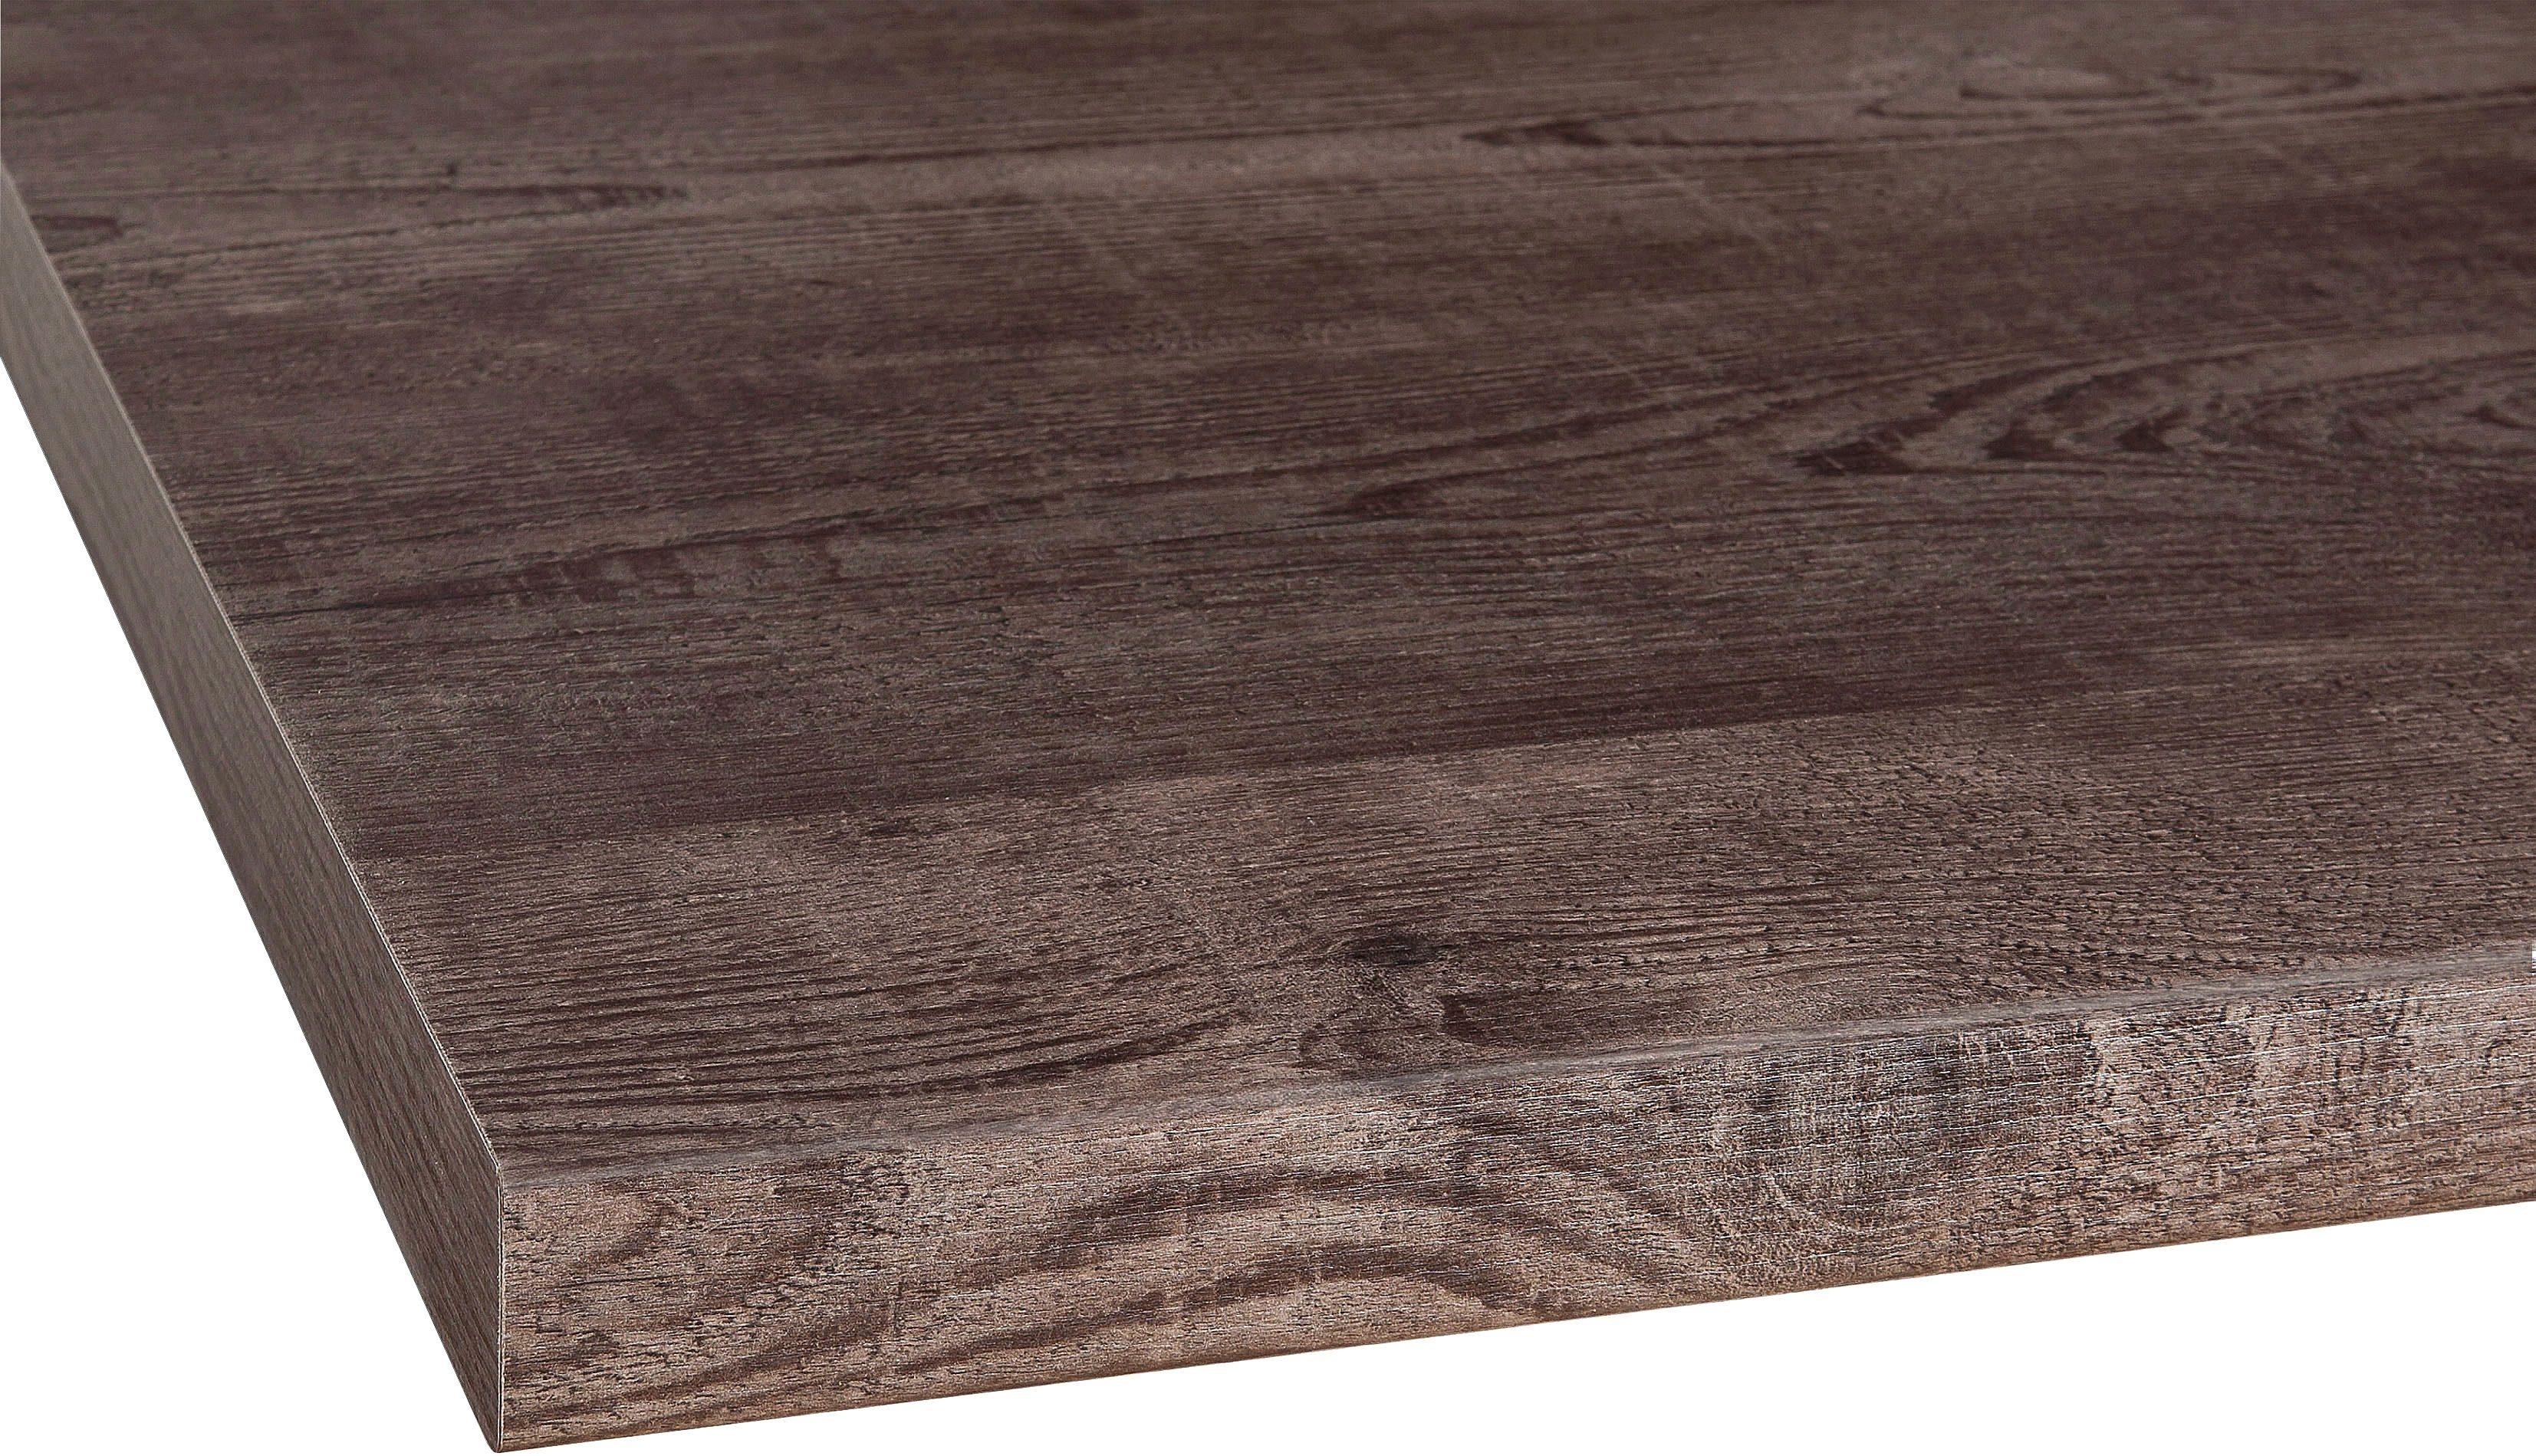 Perfekt Arbeitsplatte 80 Cm Arbeitsplatte 80 Cm Tief Holz